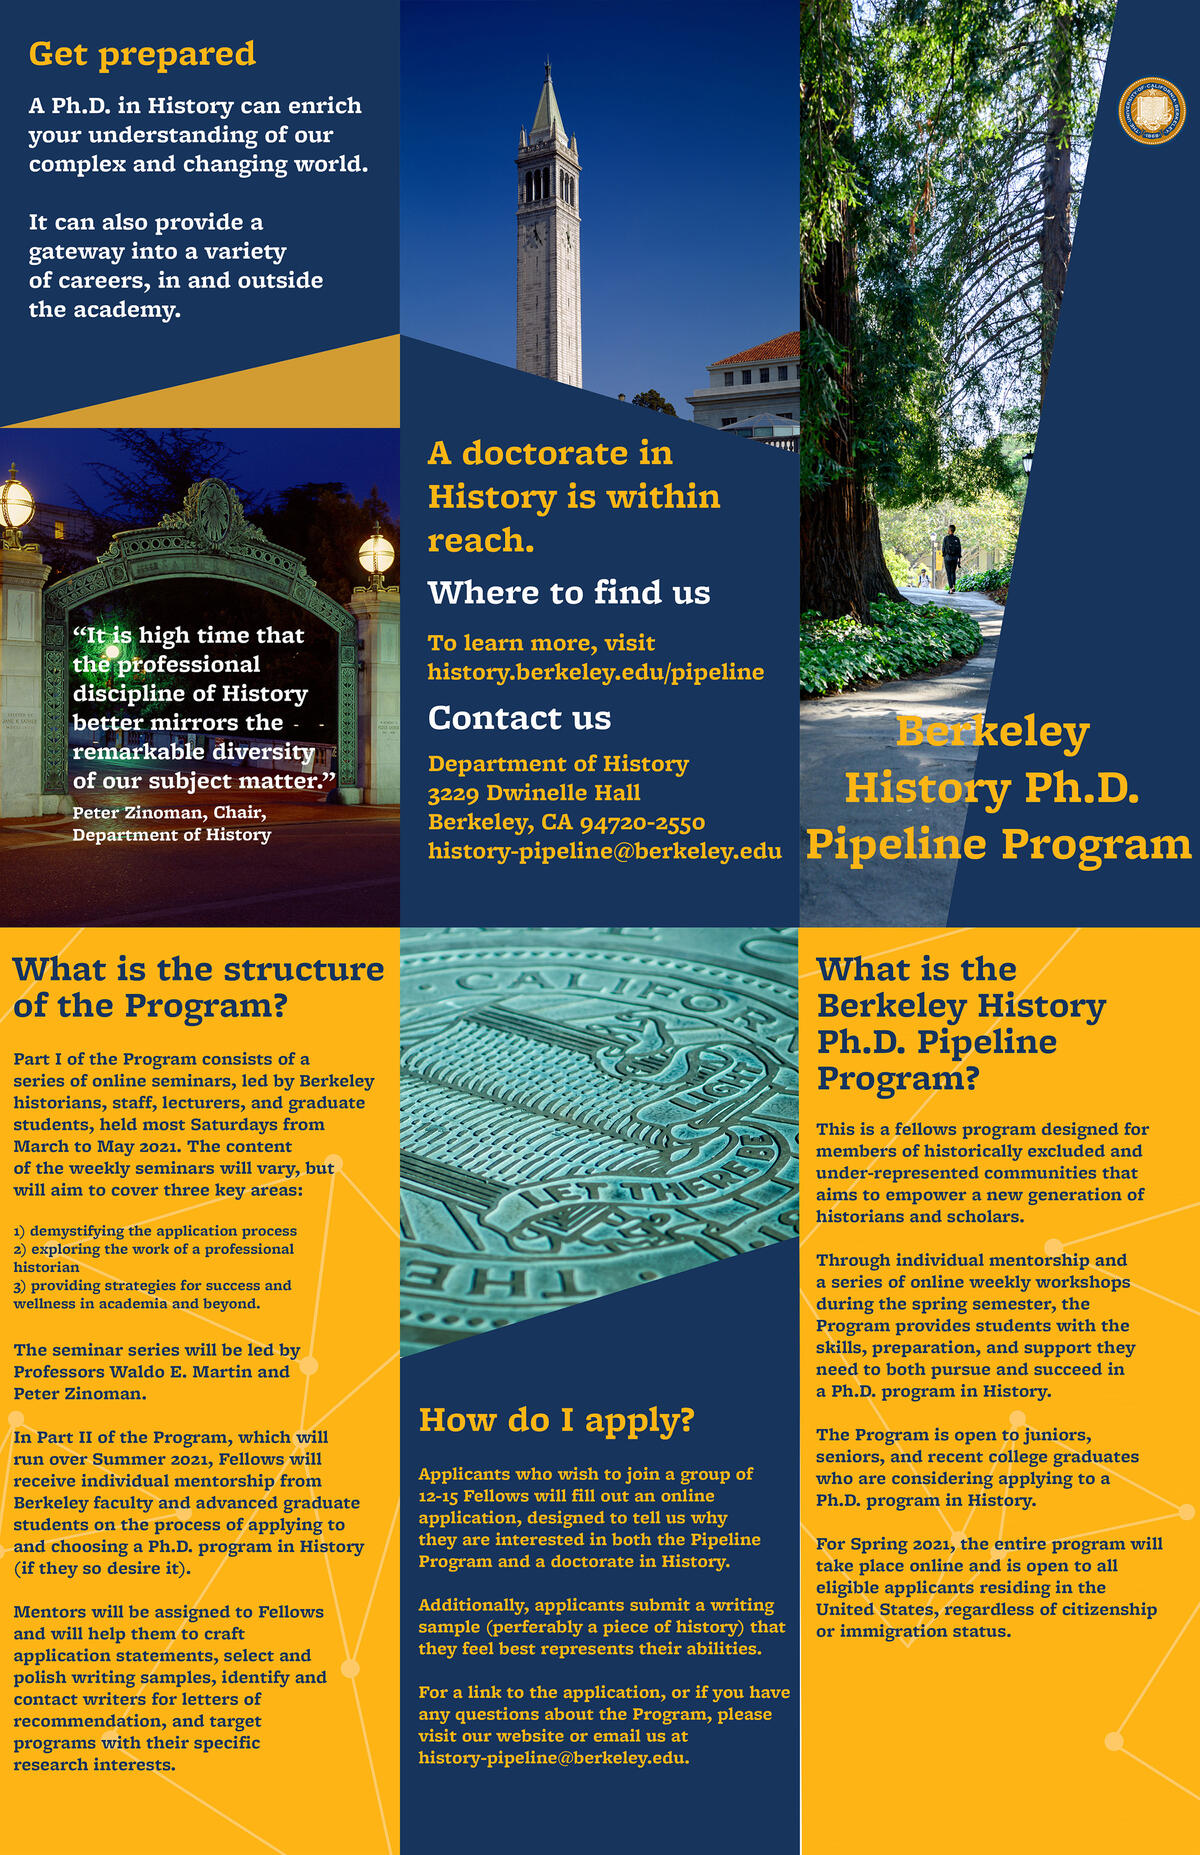 Pipeline Program brochure